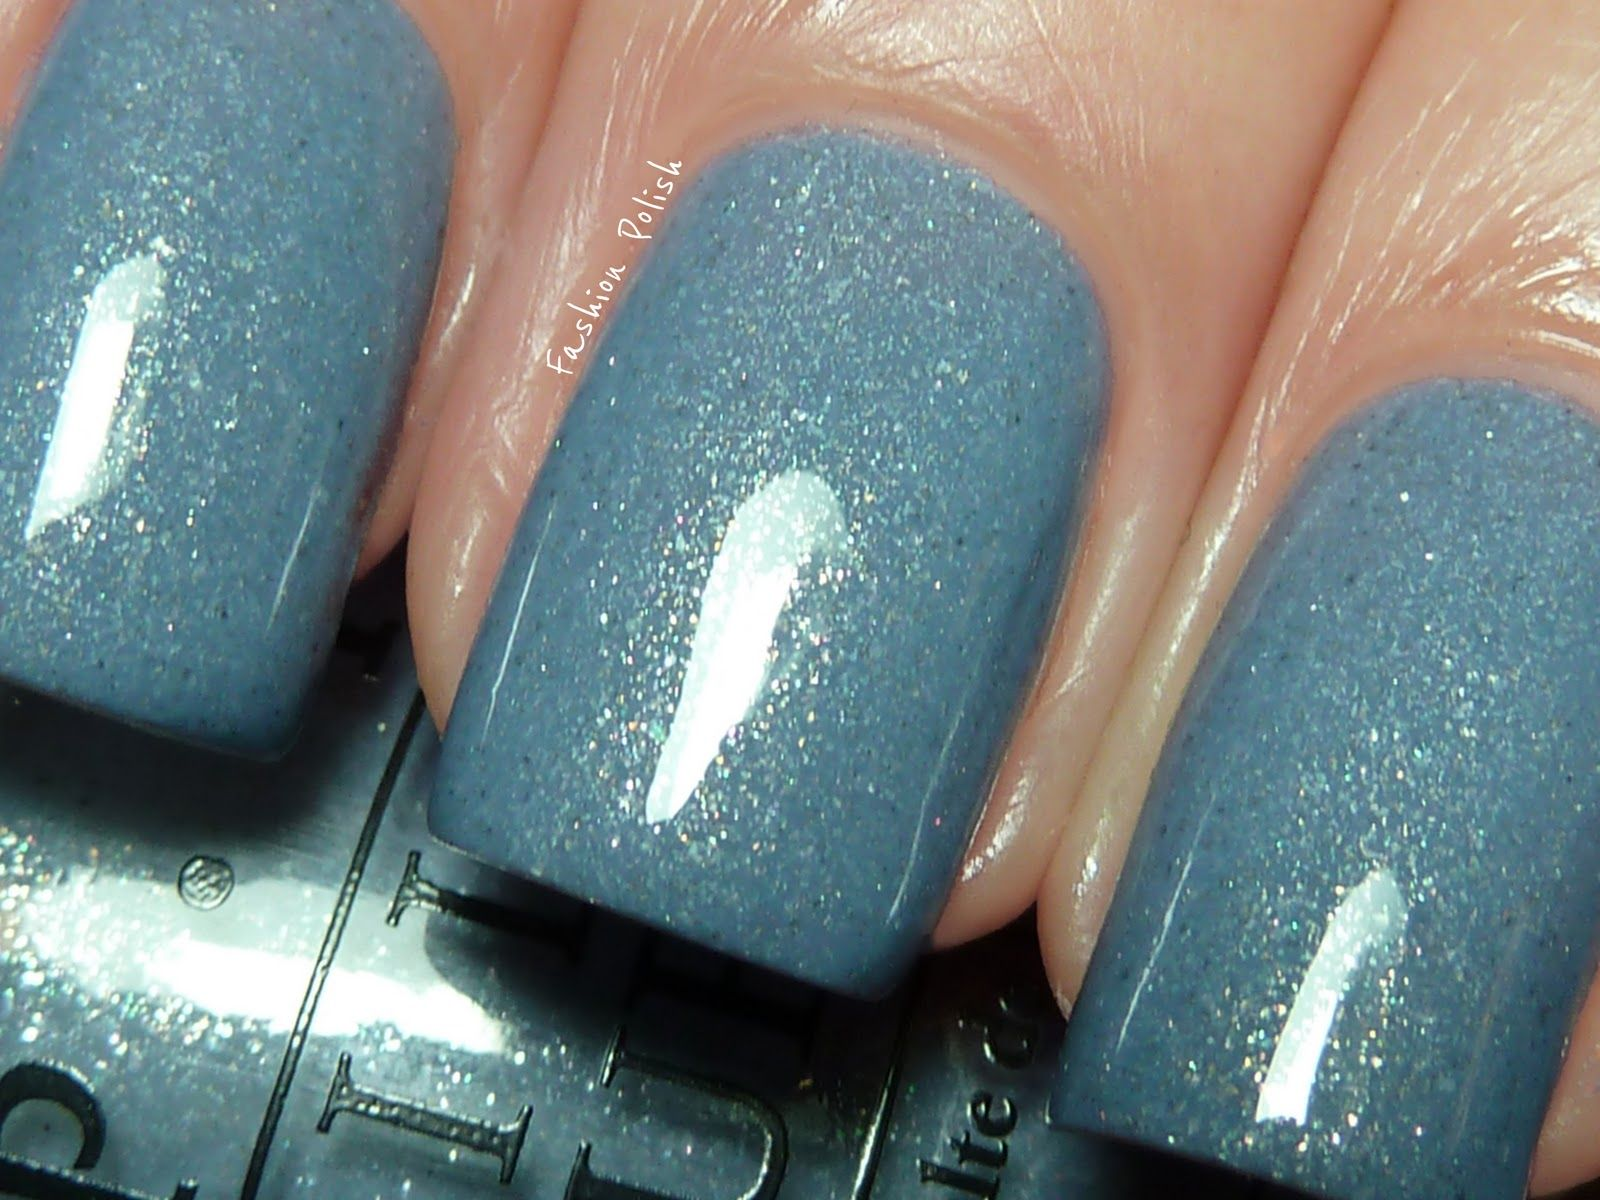 opi 'i don't give a rotterdam' glittery light blue nail polish